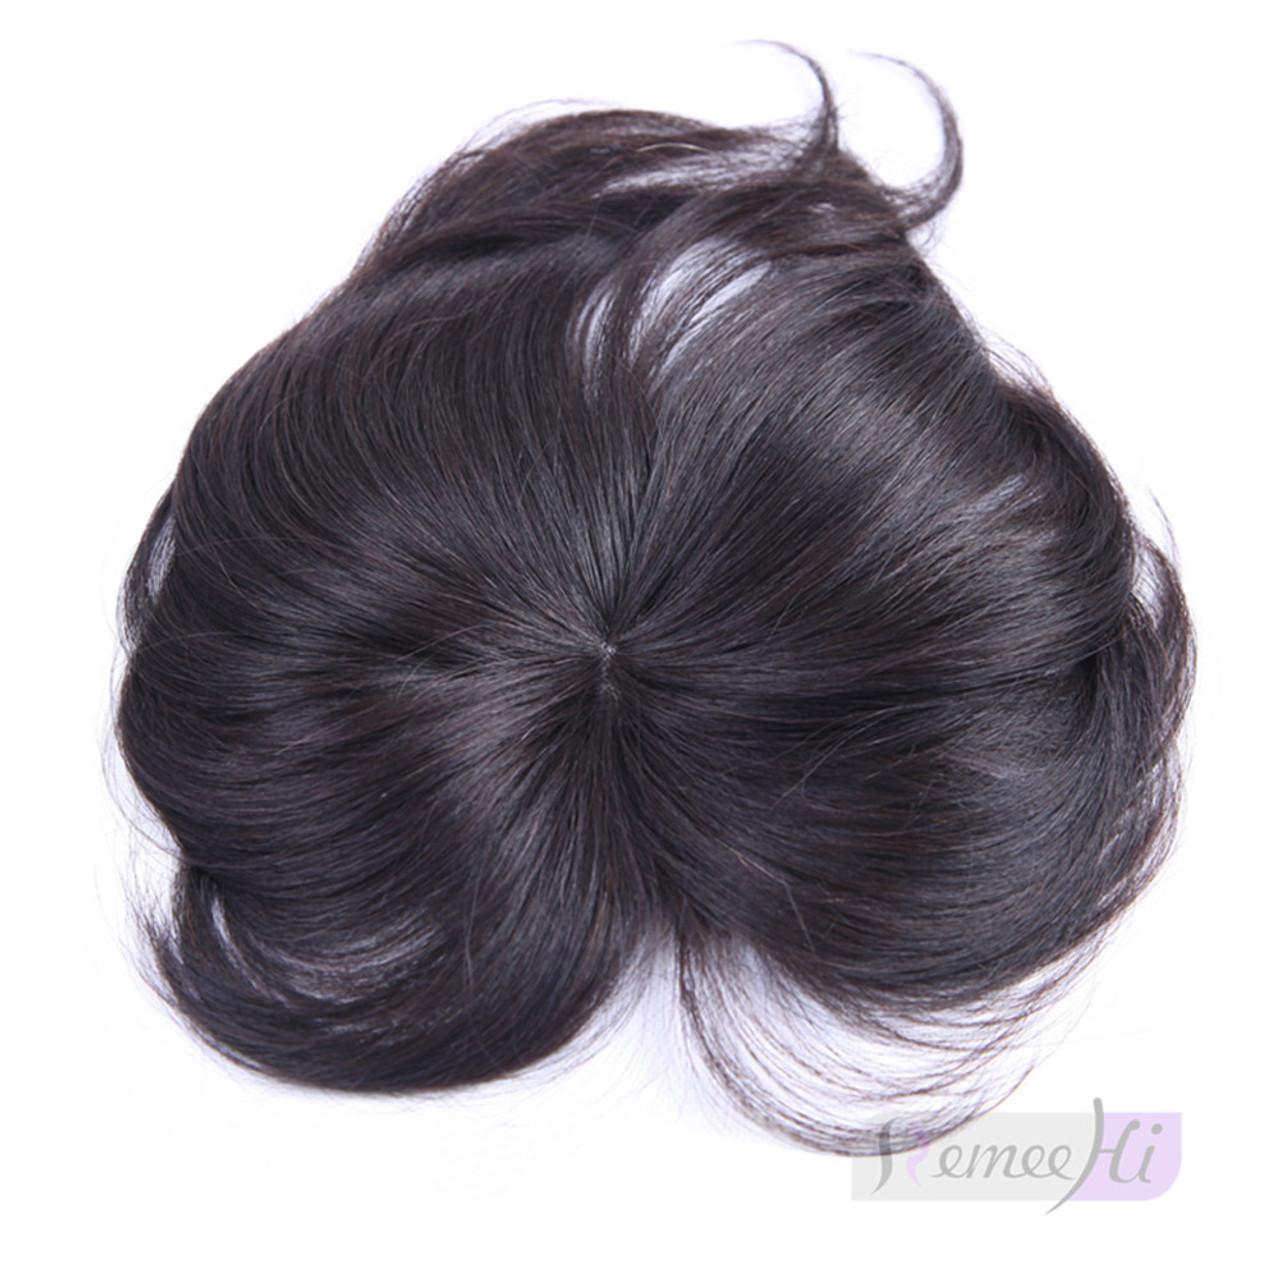 remeehi 1112 100 virgin human hair bangs clip in hair